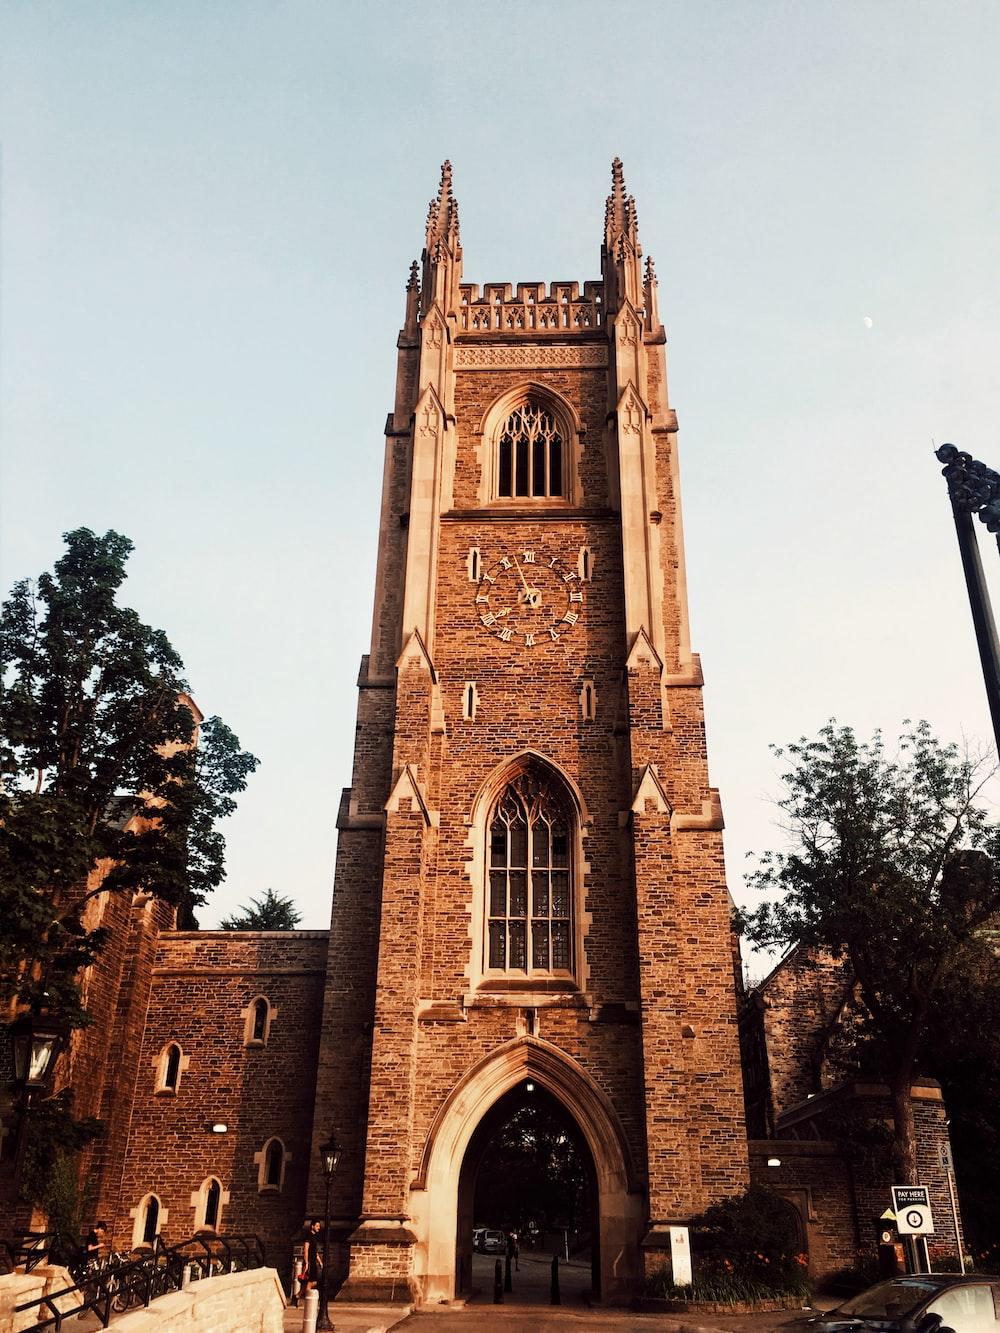 brown clock tower